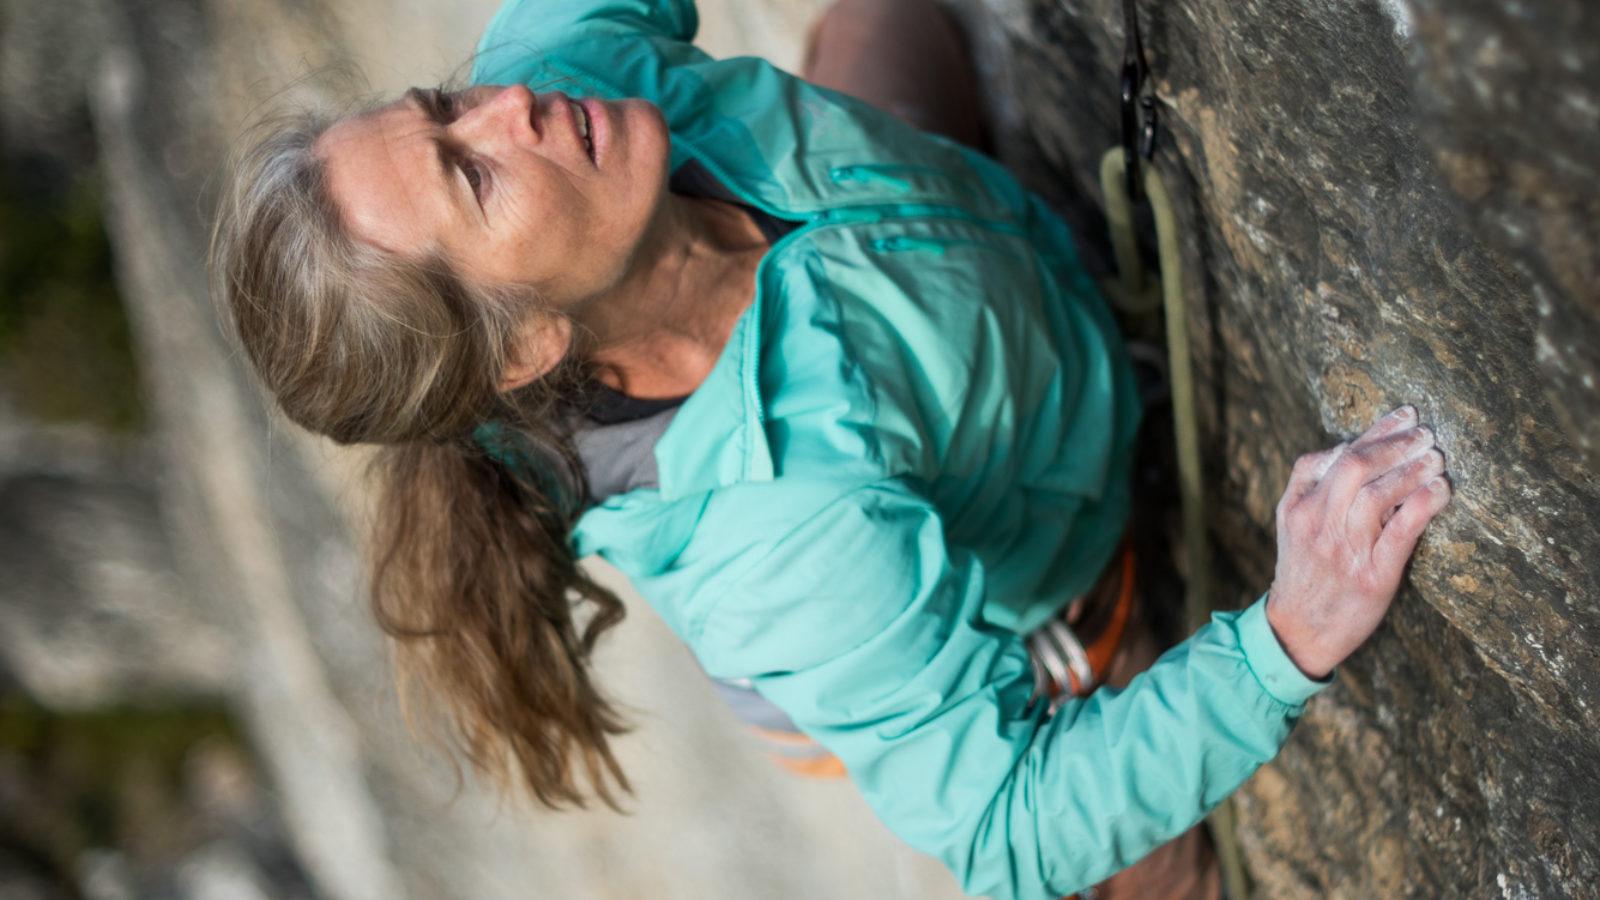 Lynn Hill climbing Little Big Wall Wanaka, Dom Channon Photo